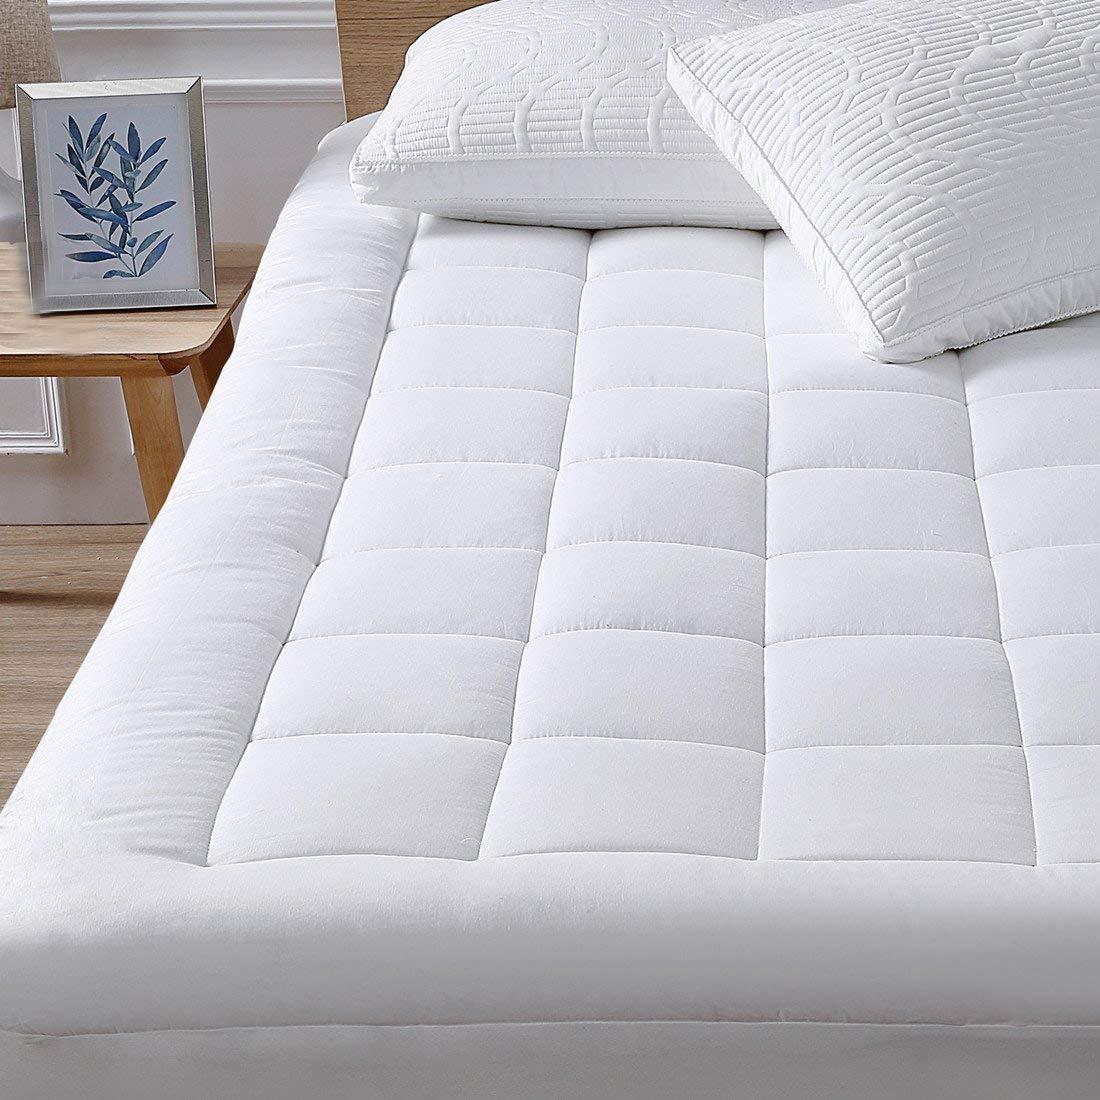 Amazon Com Memory Foam Pillow Orthopedic Pillow For